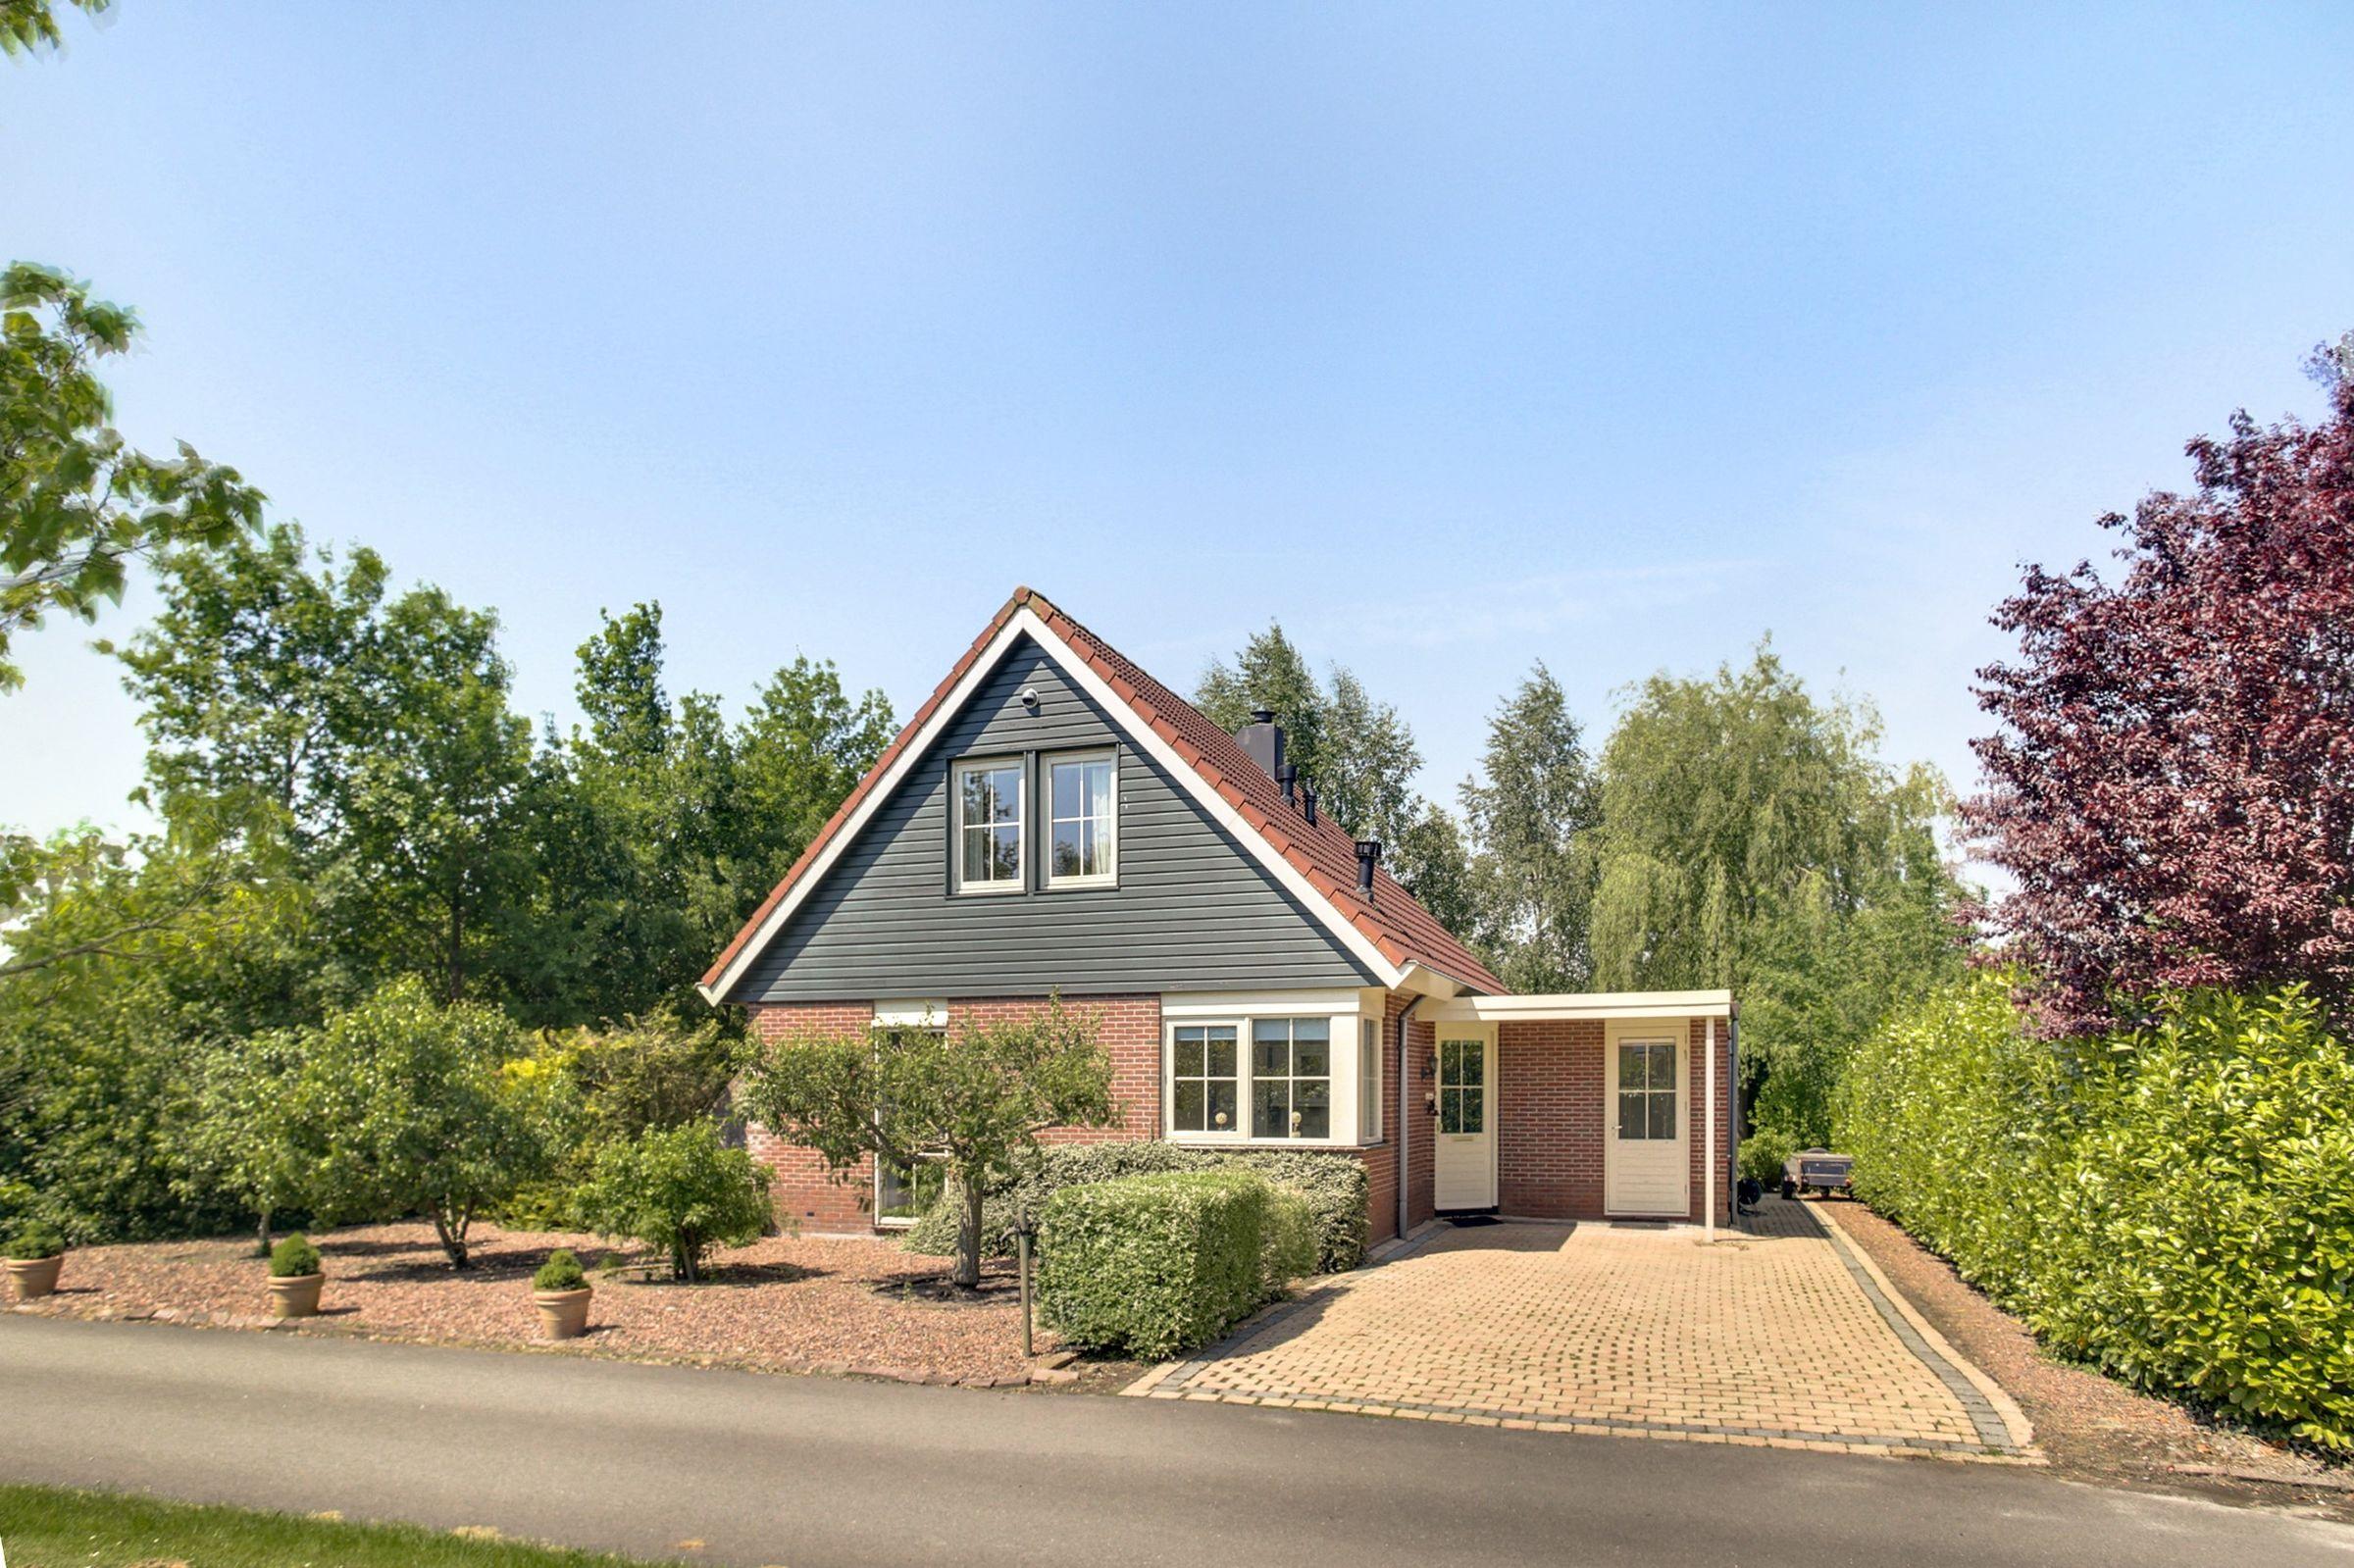 Bosruiterweg 25131, Zeewolde